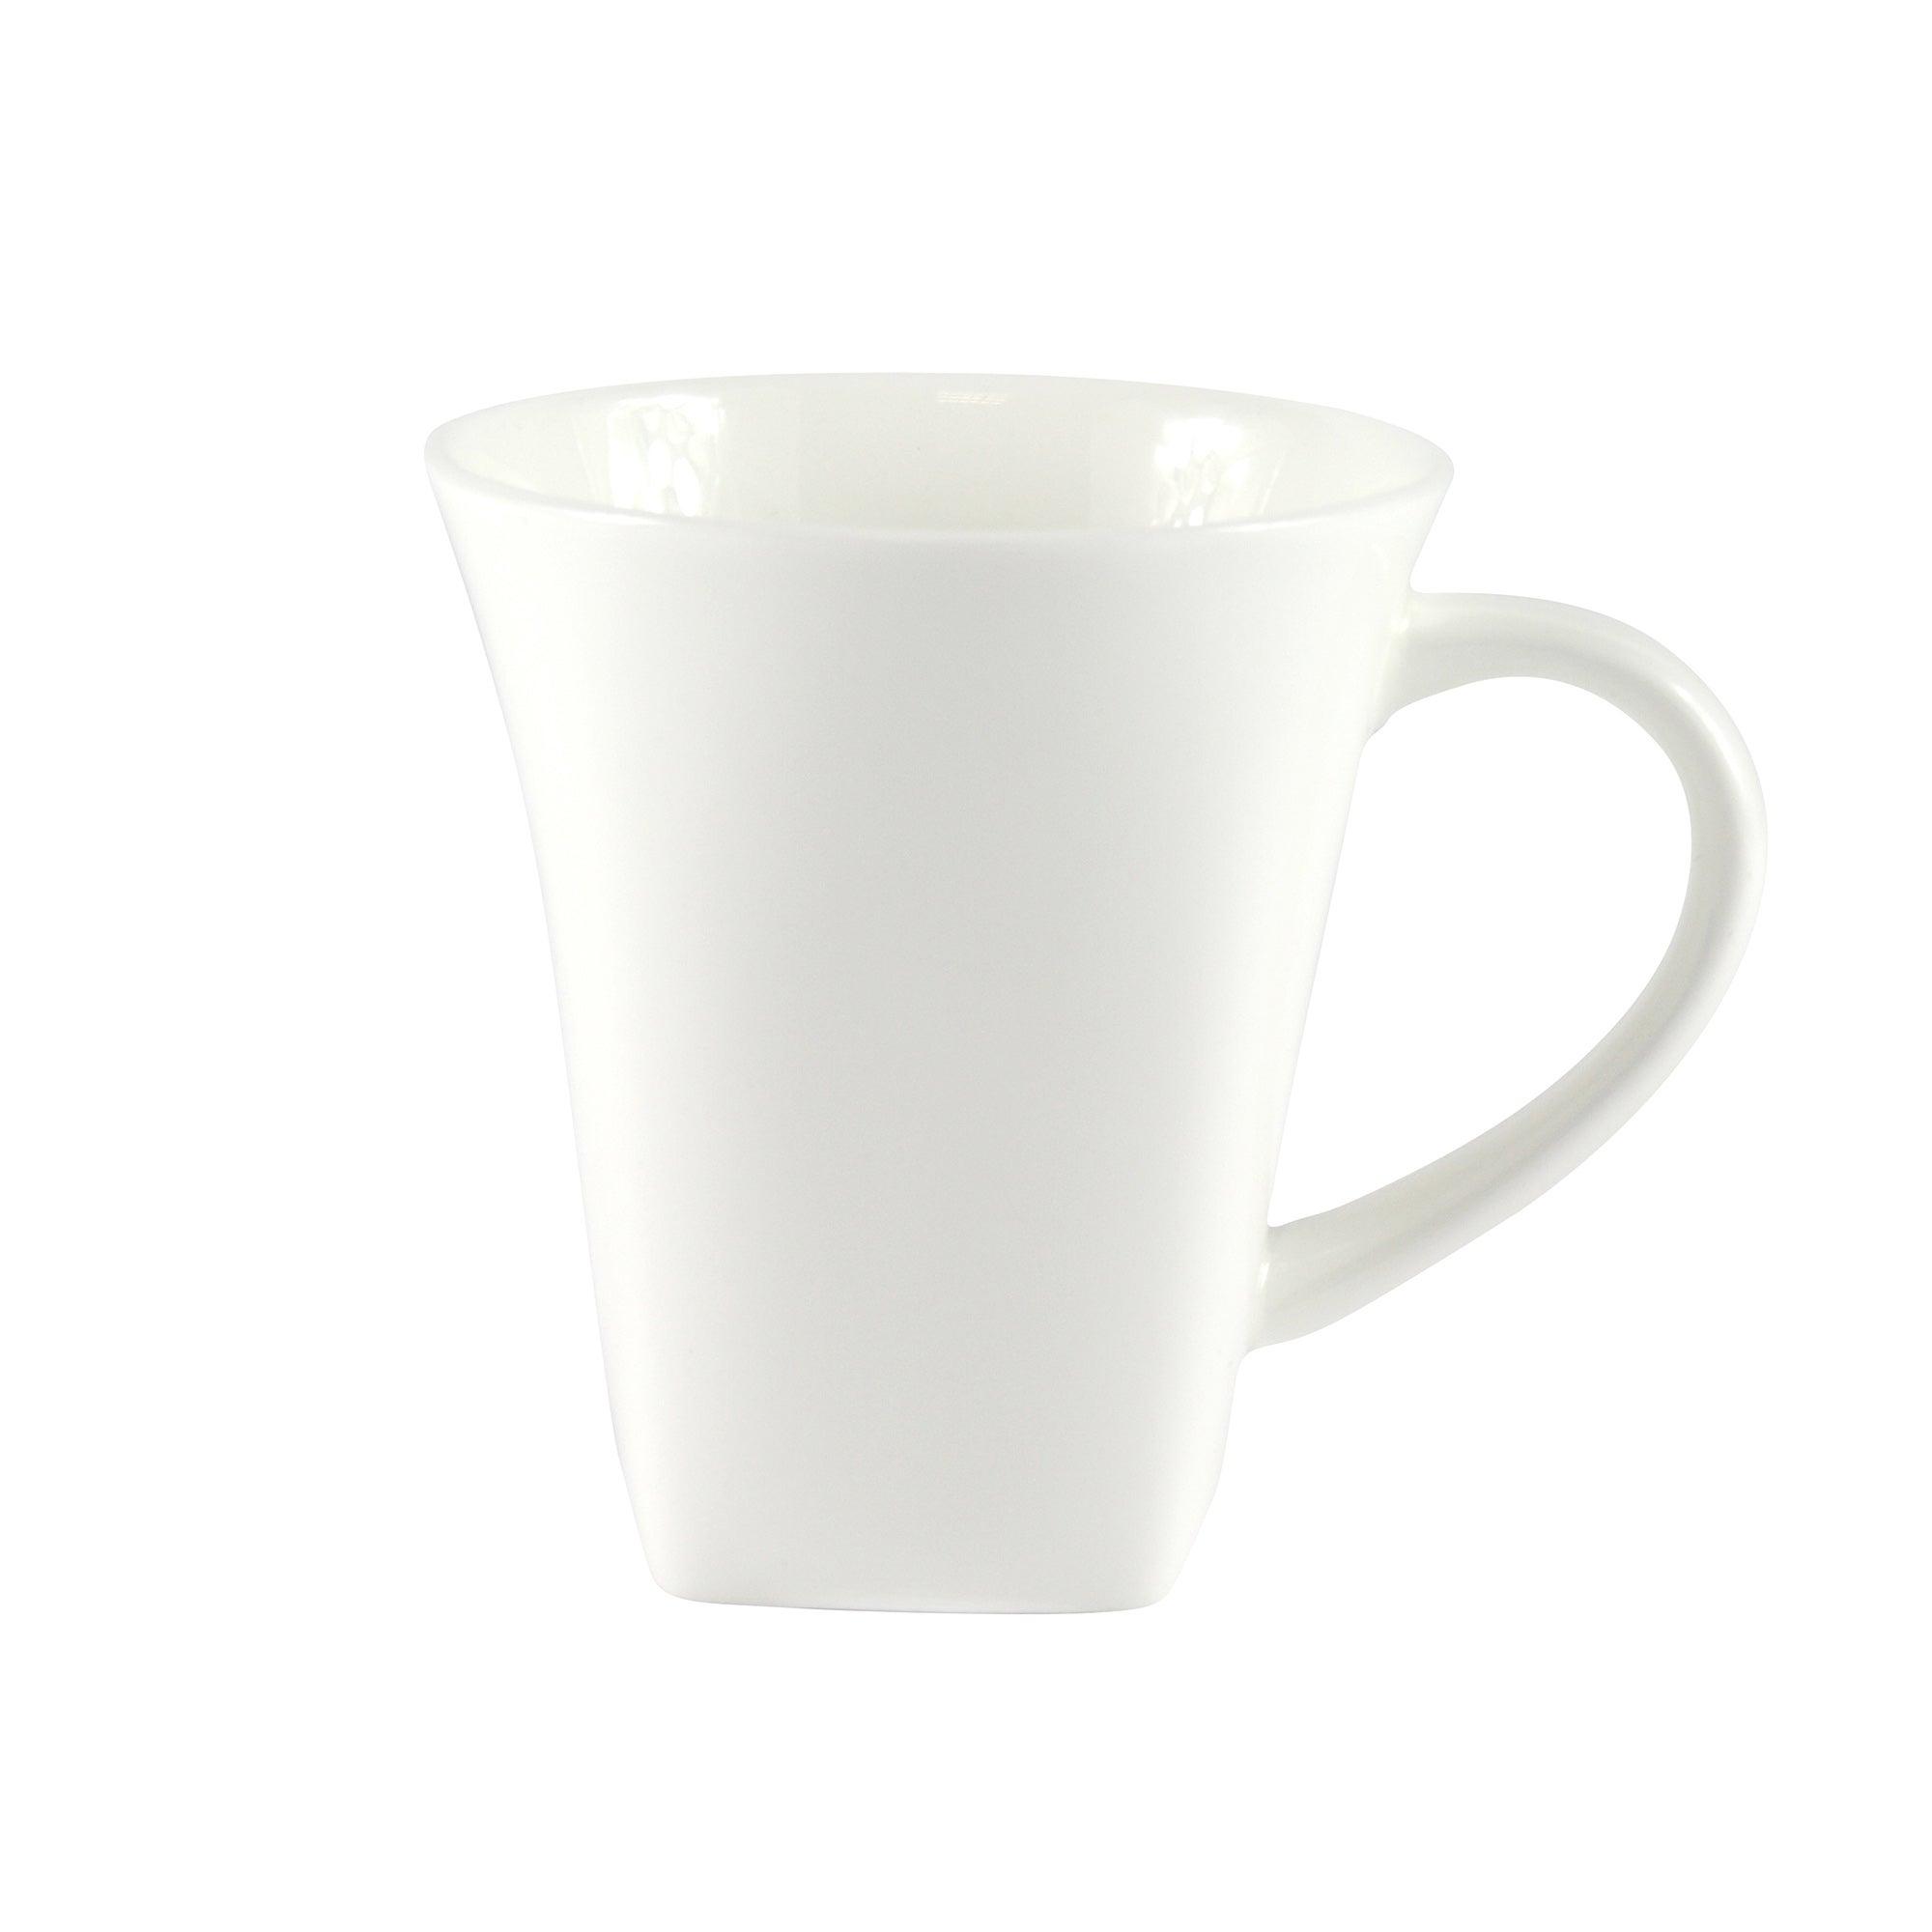 Dorma Knightsbridge Mug